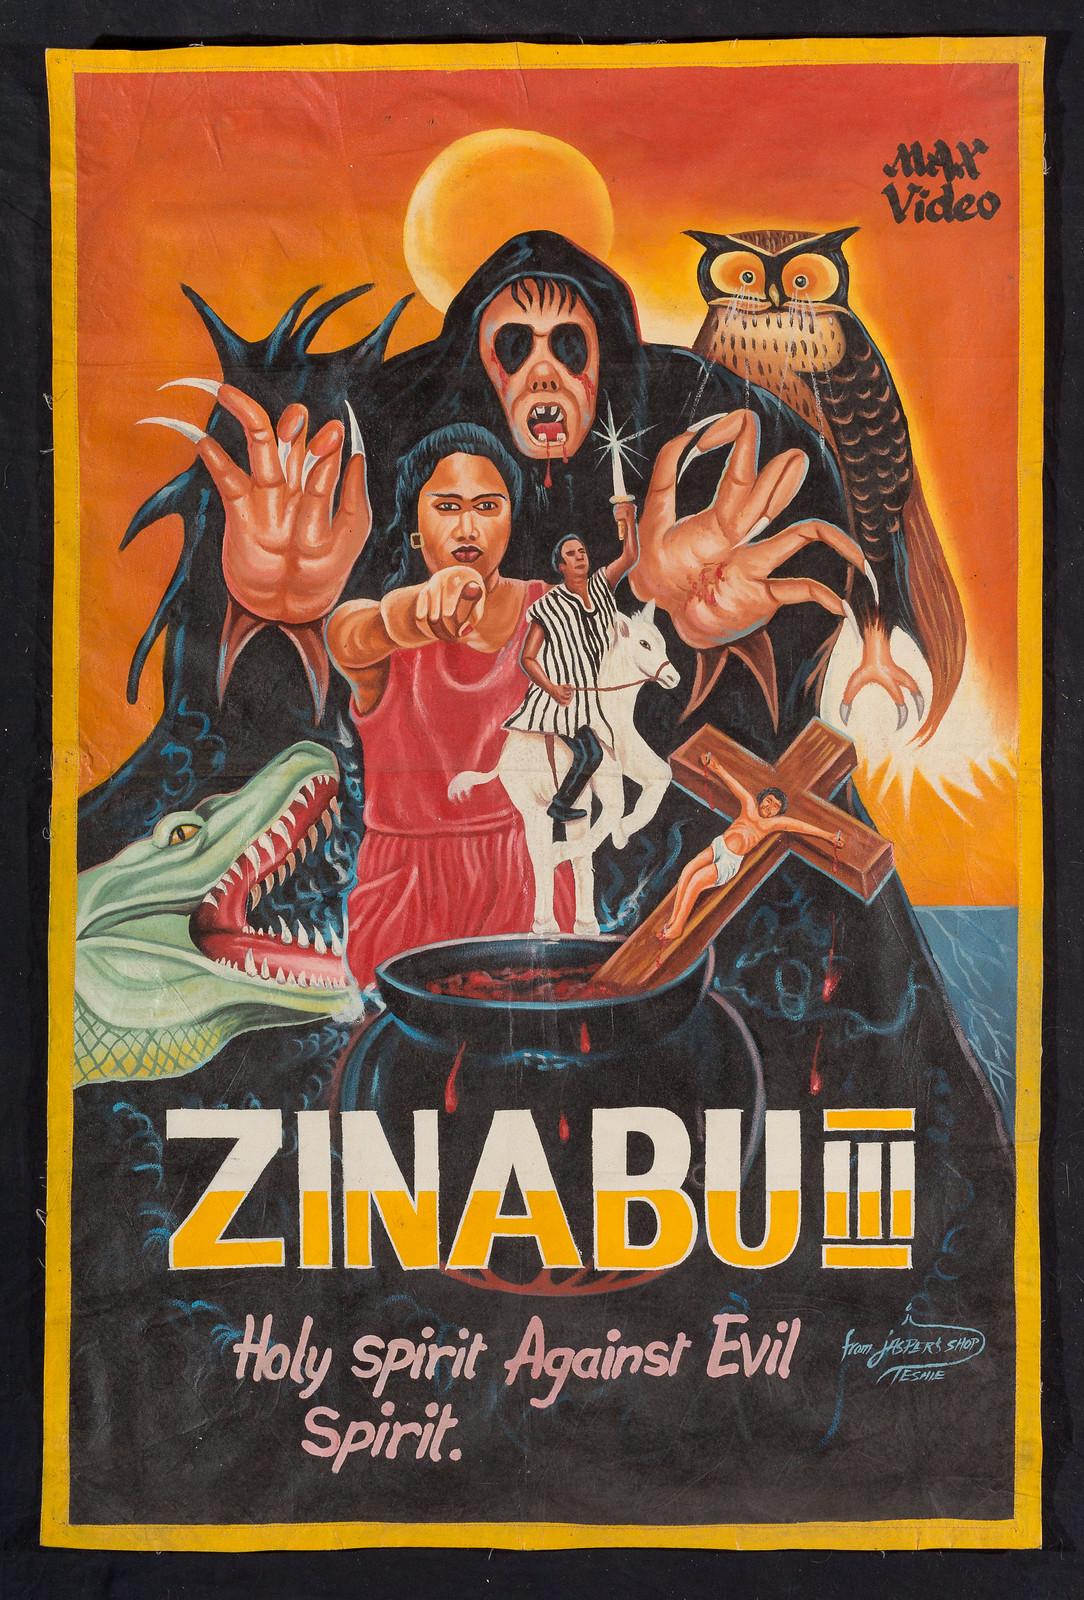 Zinabu 3